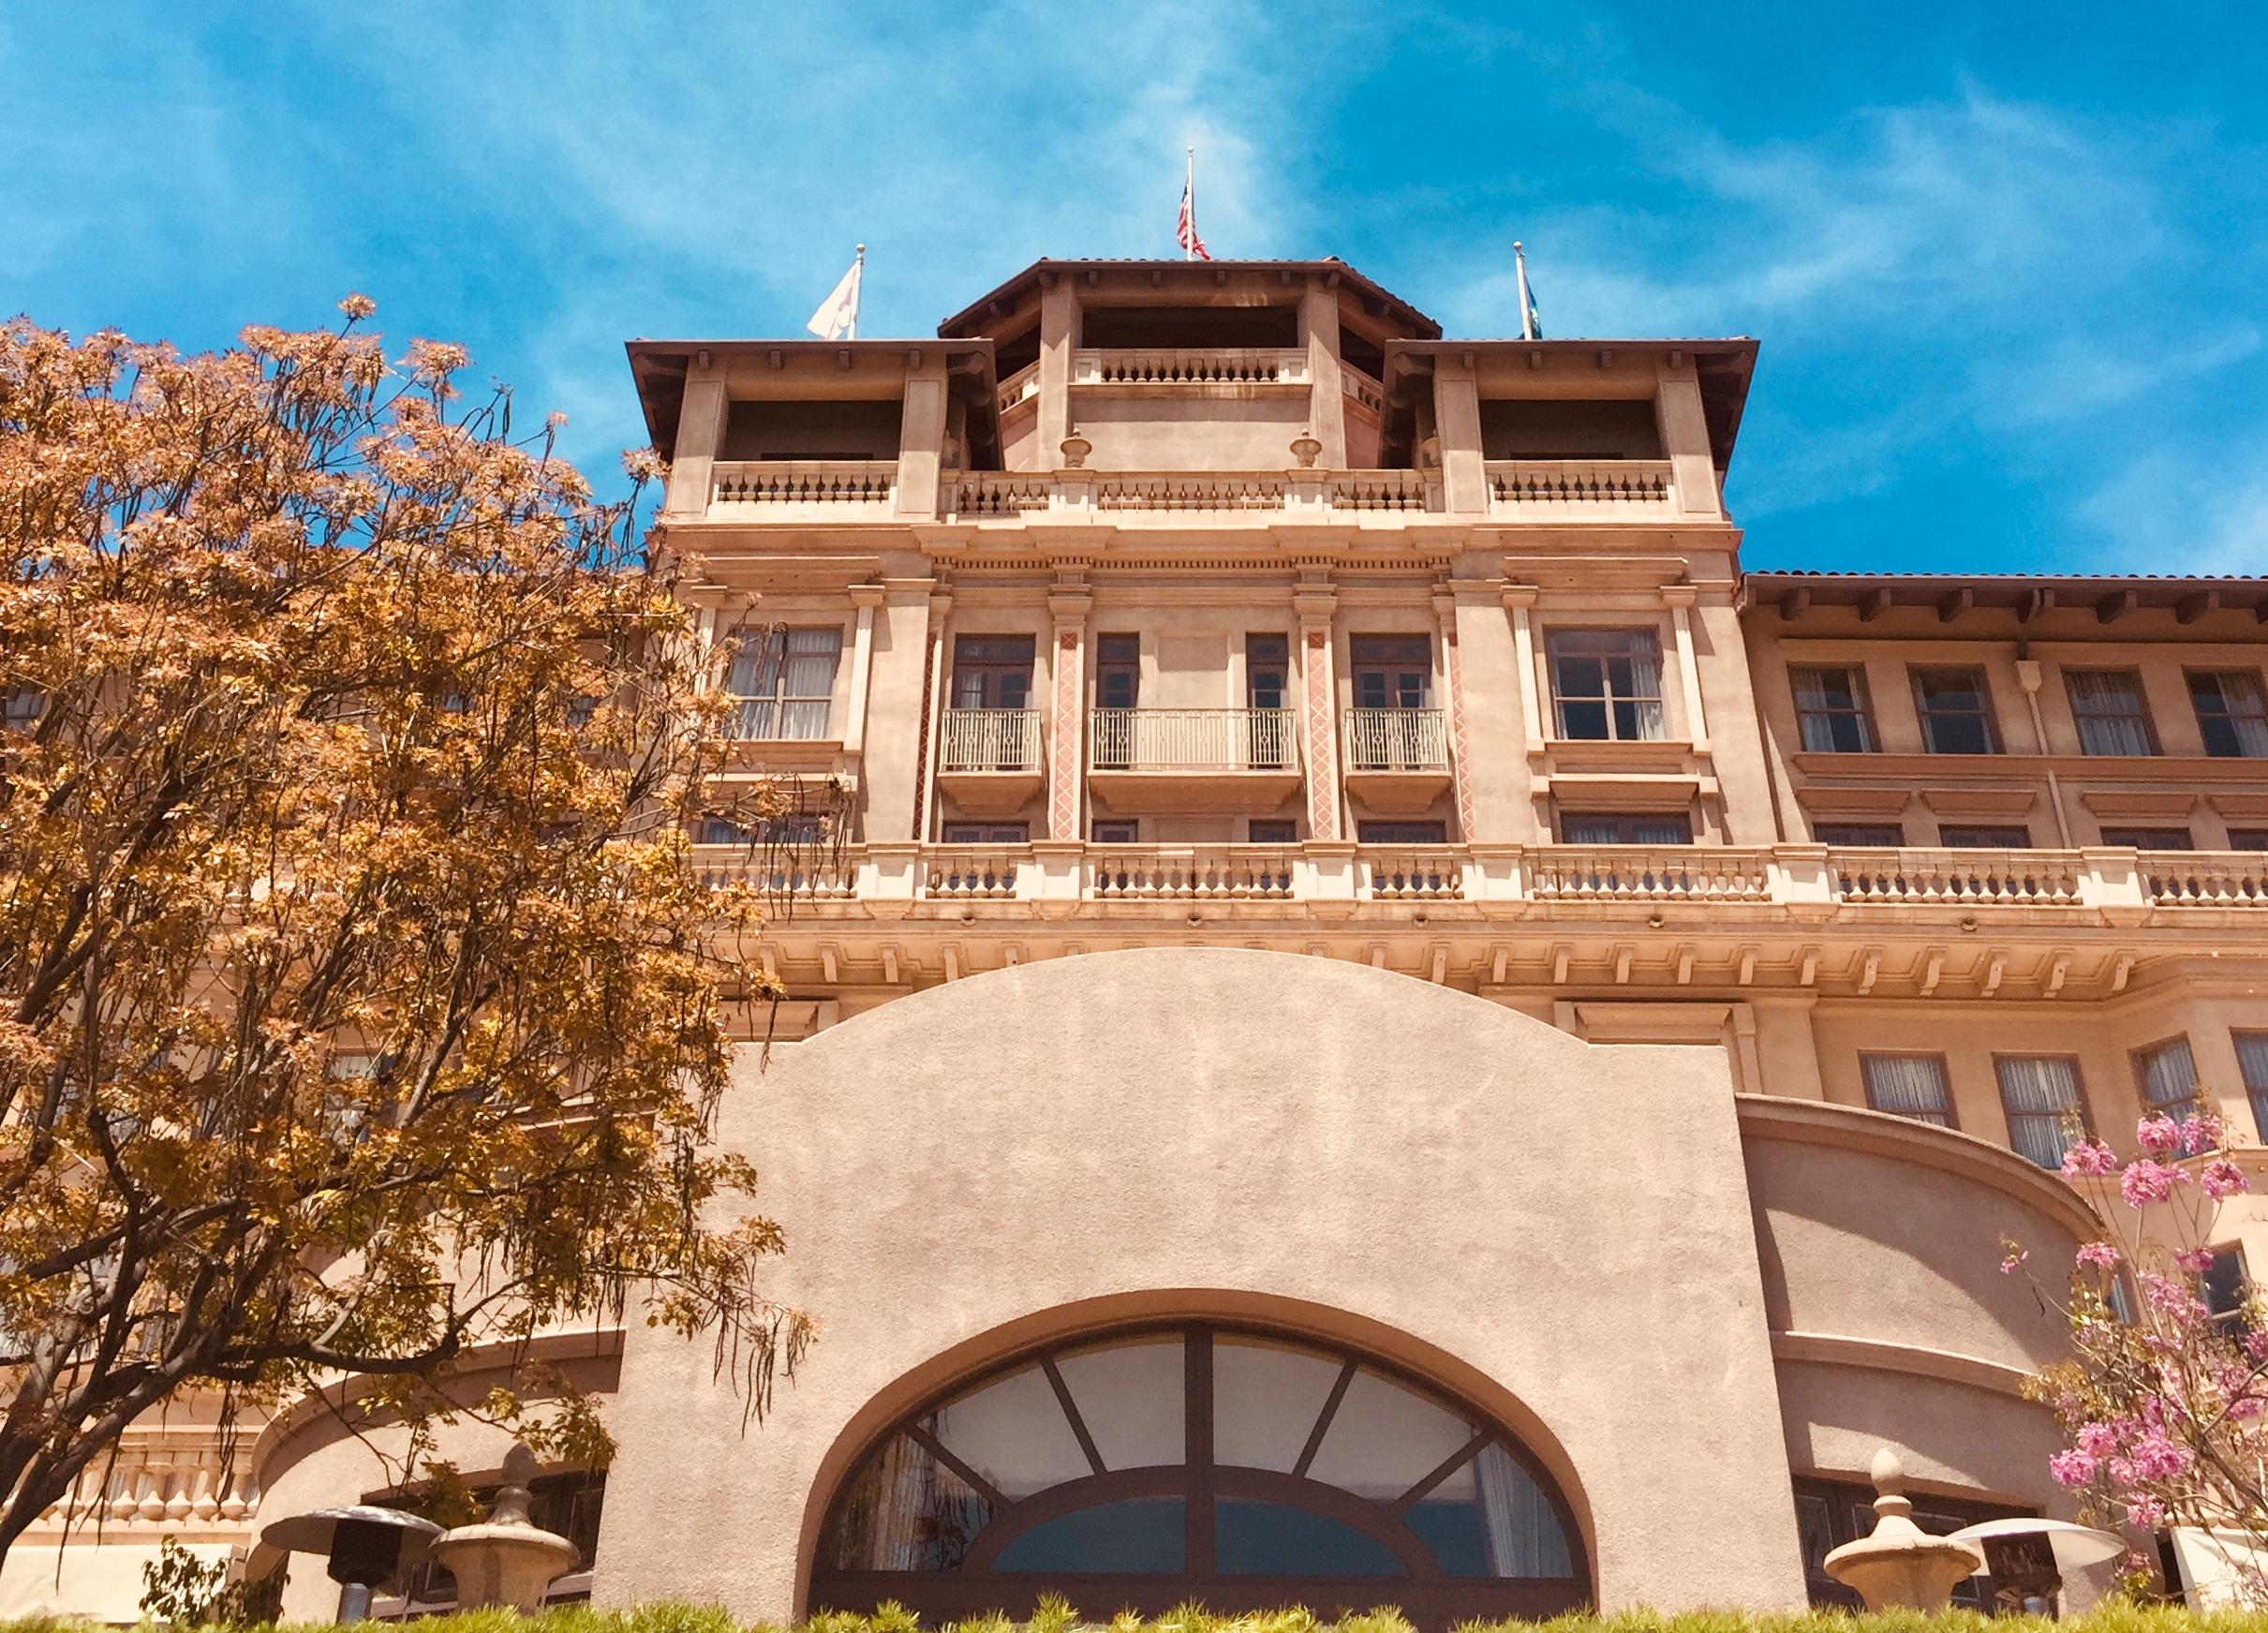 Langham Huntington hotel, location of Mom 2.0